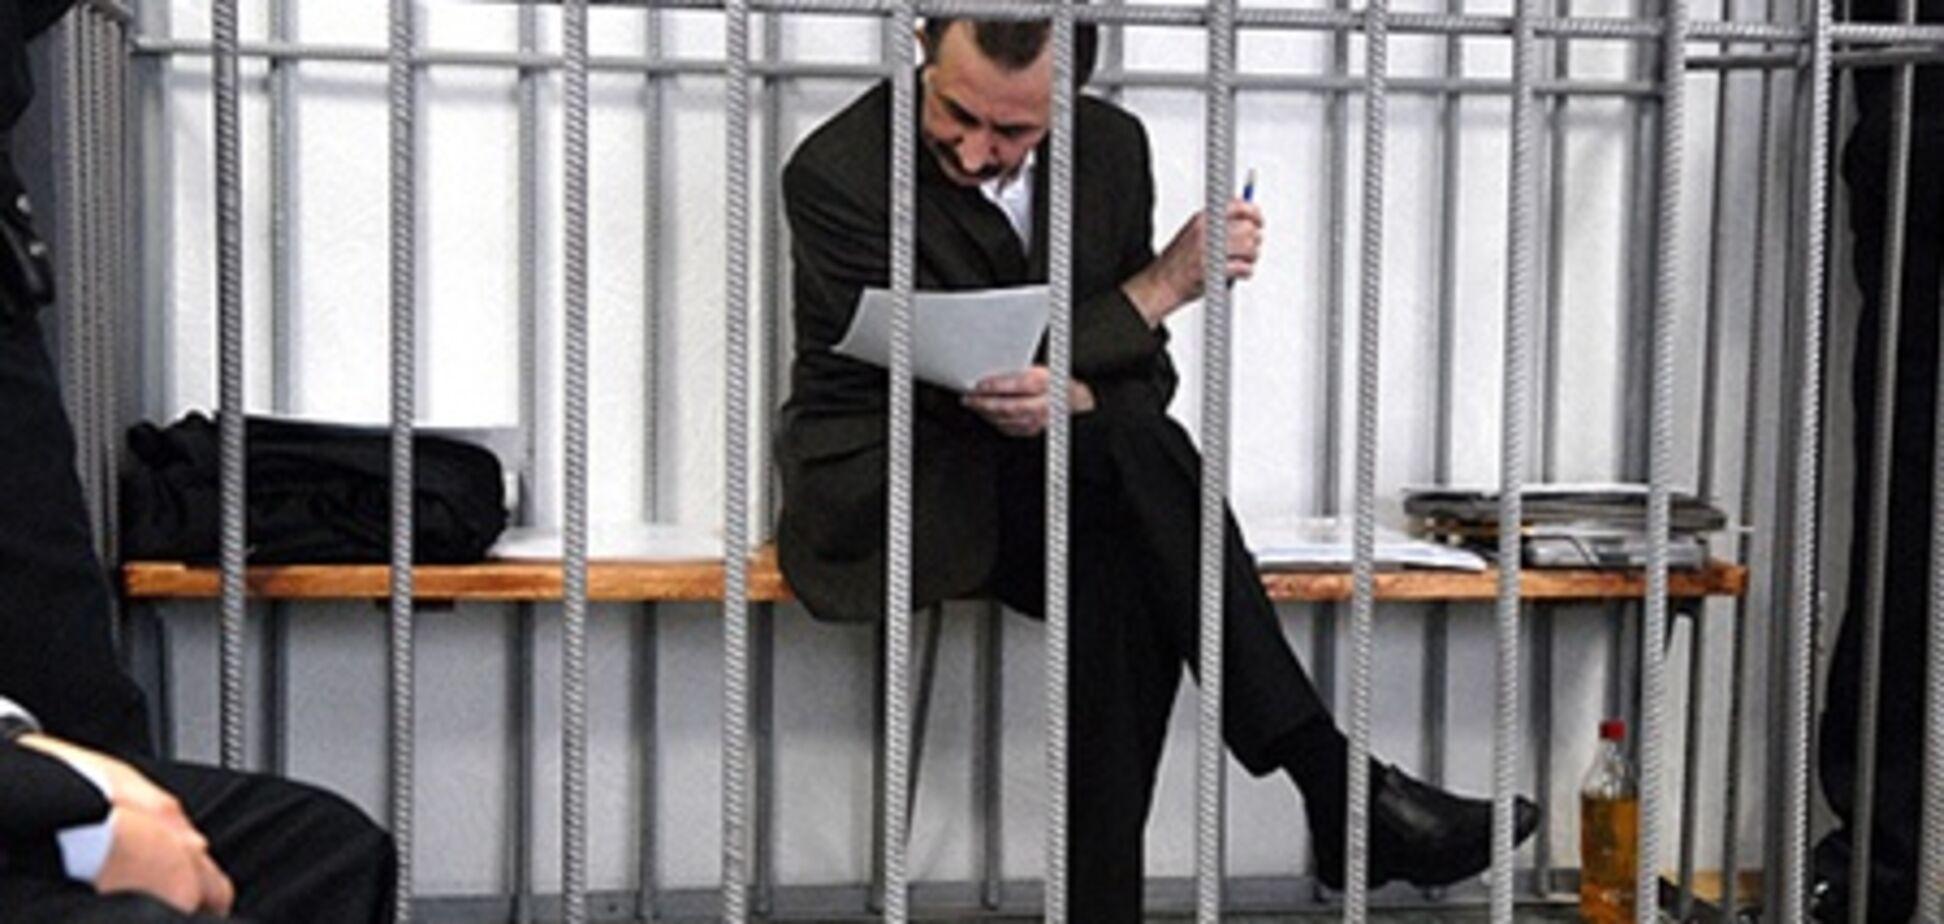 Судья Зварыч заработал на взятках почти миллион гривен